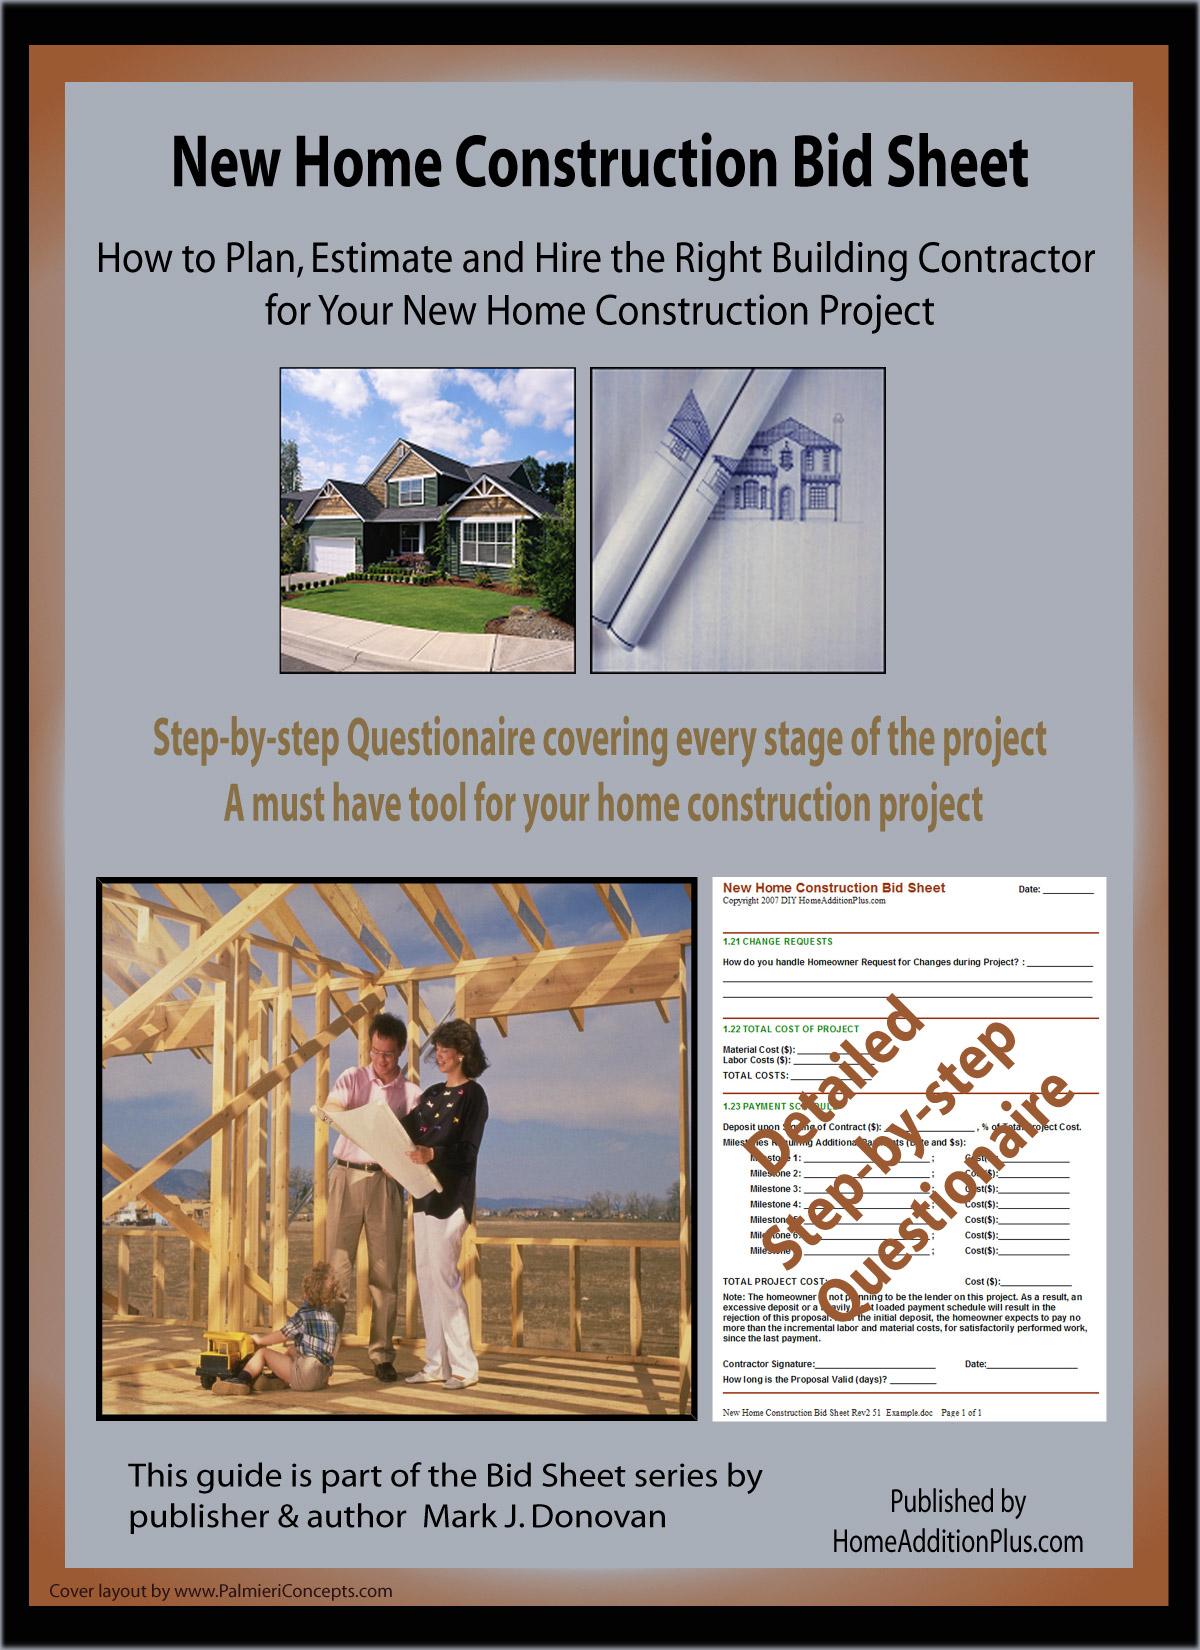 New Home Construction Bid Sheet